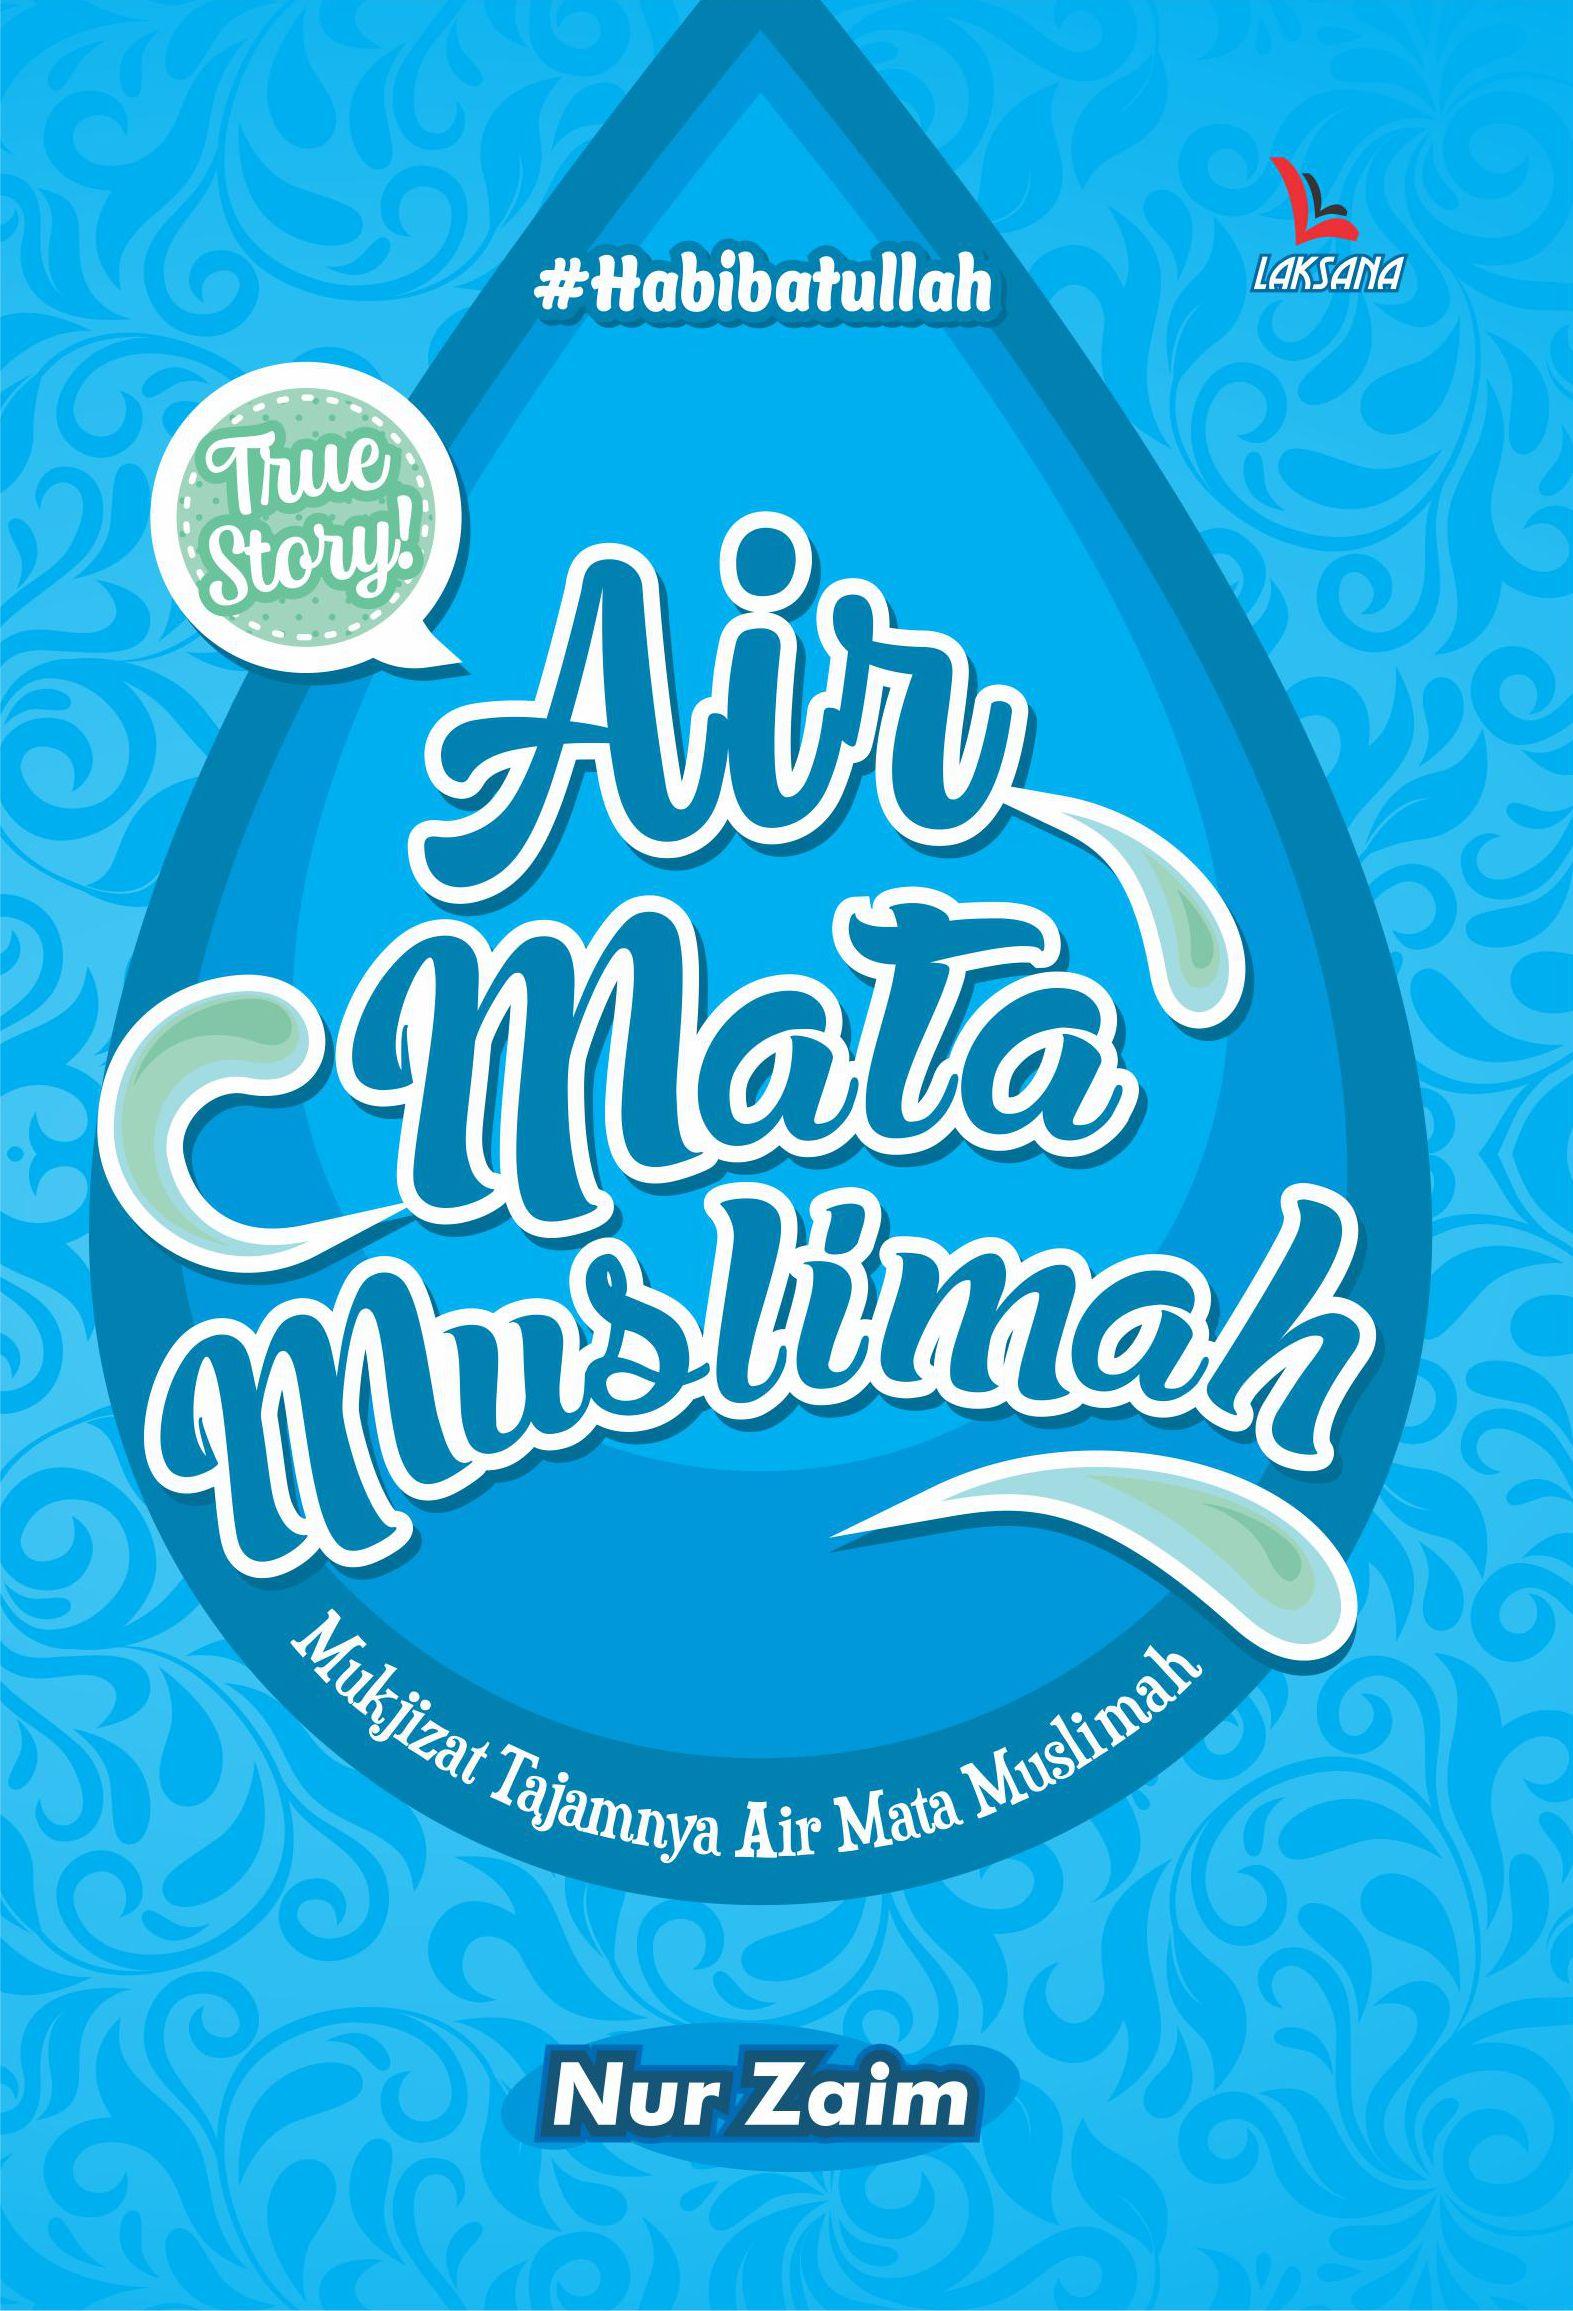 Air mata muslimah [sumber elektronis]